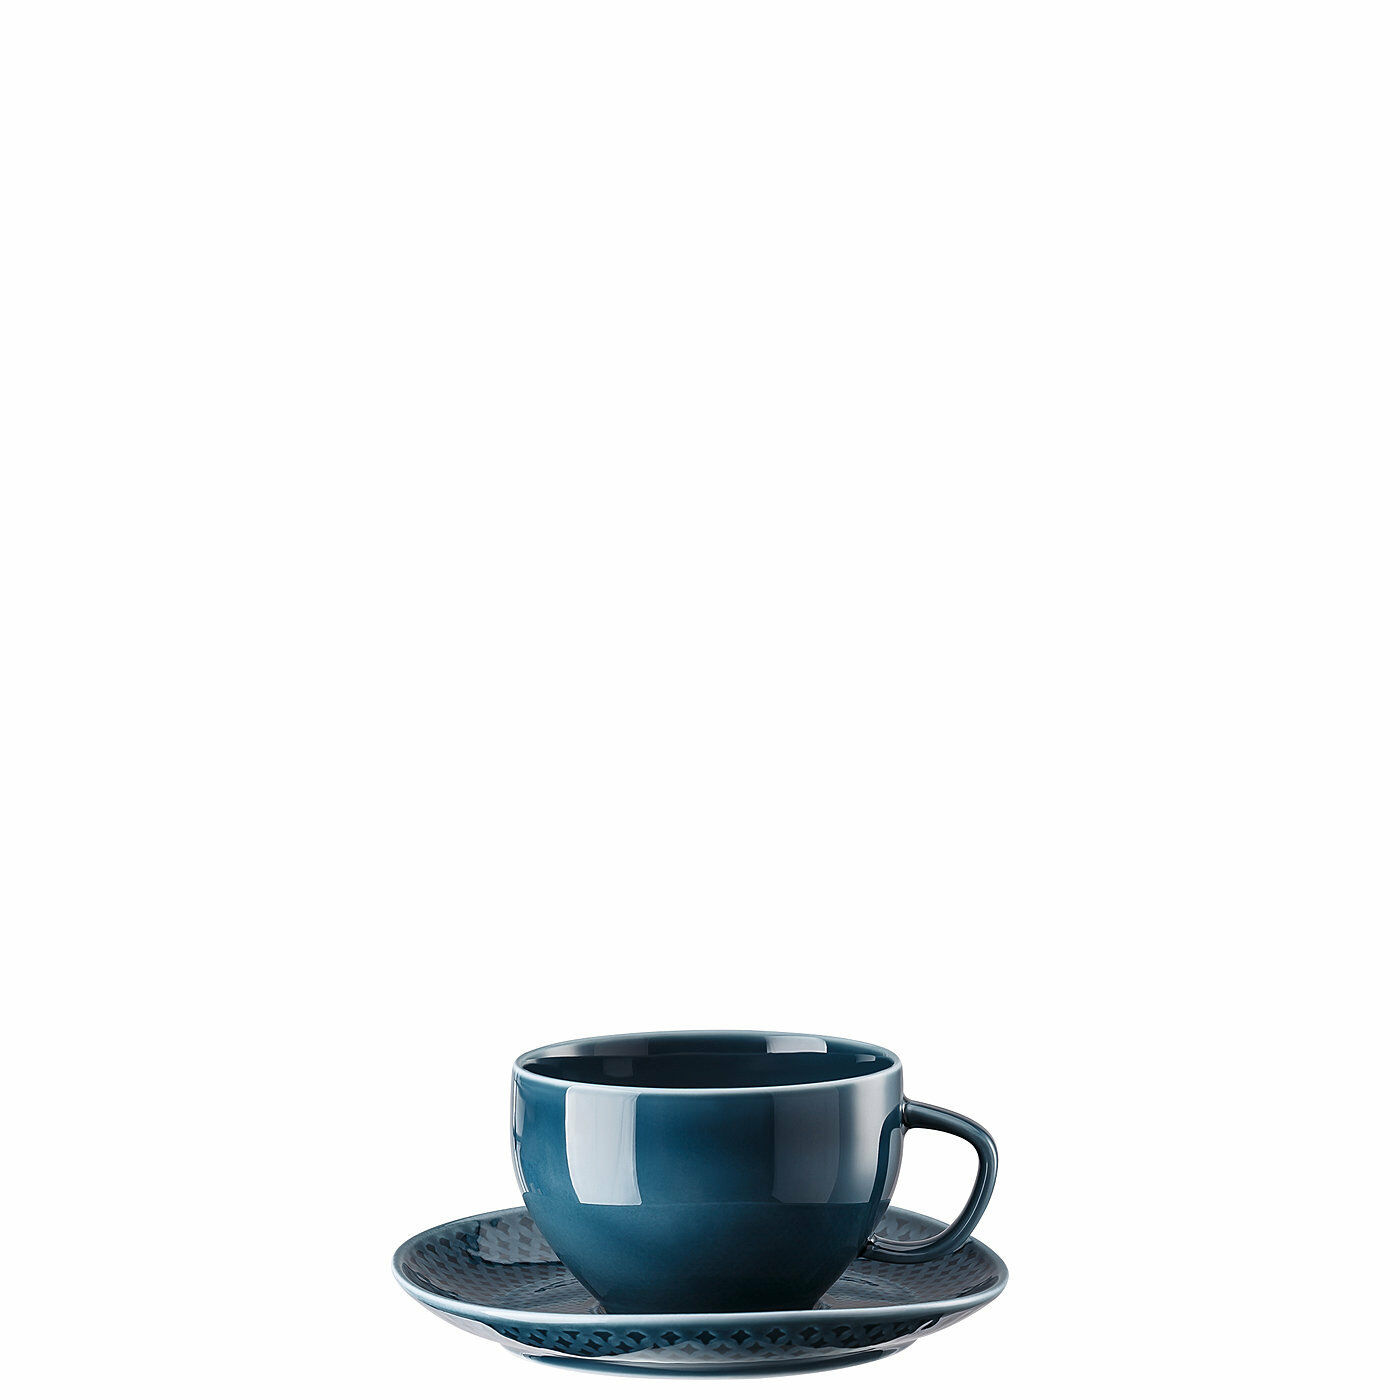 Rosenthal - Junto Ocean bleu - 6 tazze the con piatto cl 24 - Rivenditore